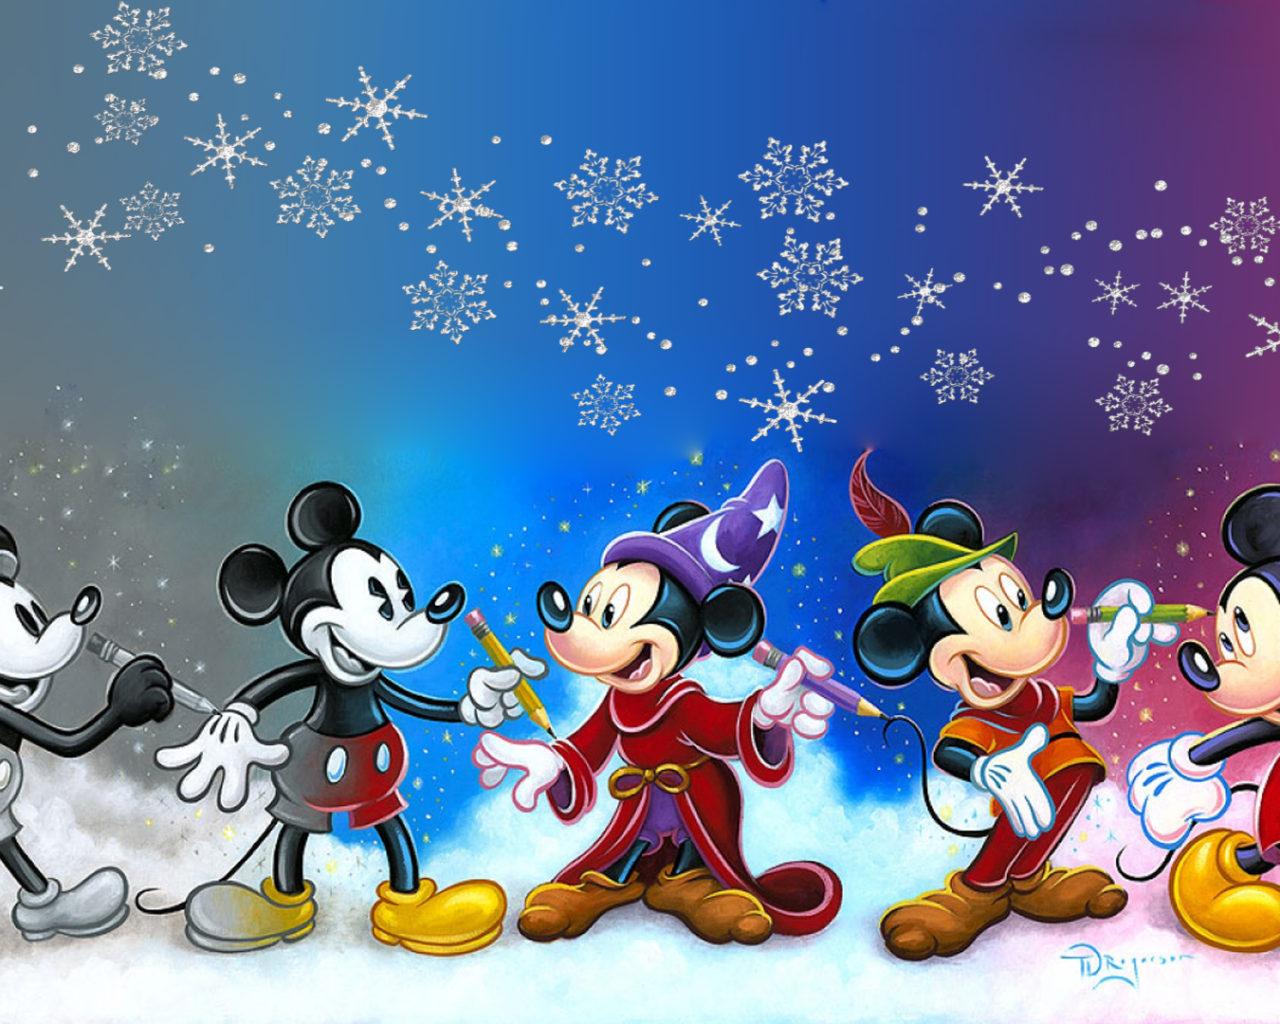 Hd Disney Cartoon Wallpapers Mickey Mouse Cartoons Art Cinemascopic Desktop Wallpaper